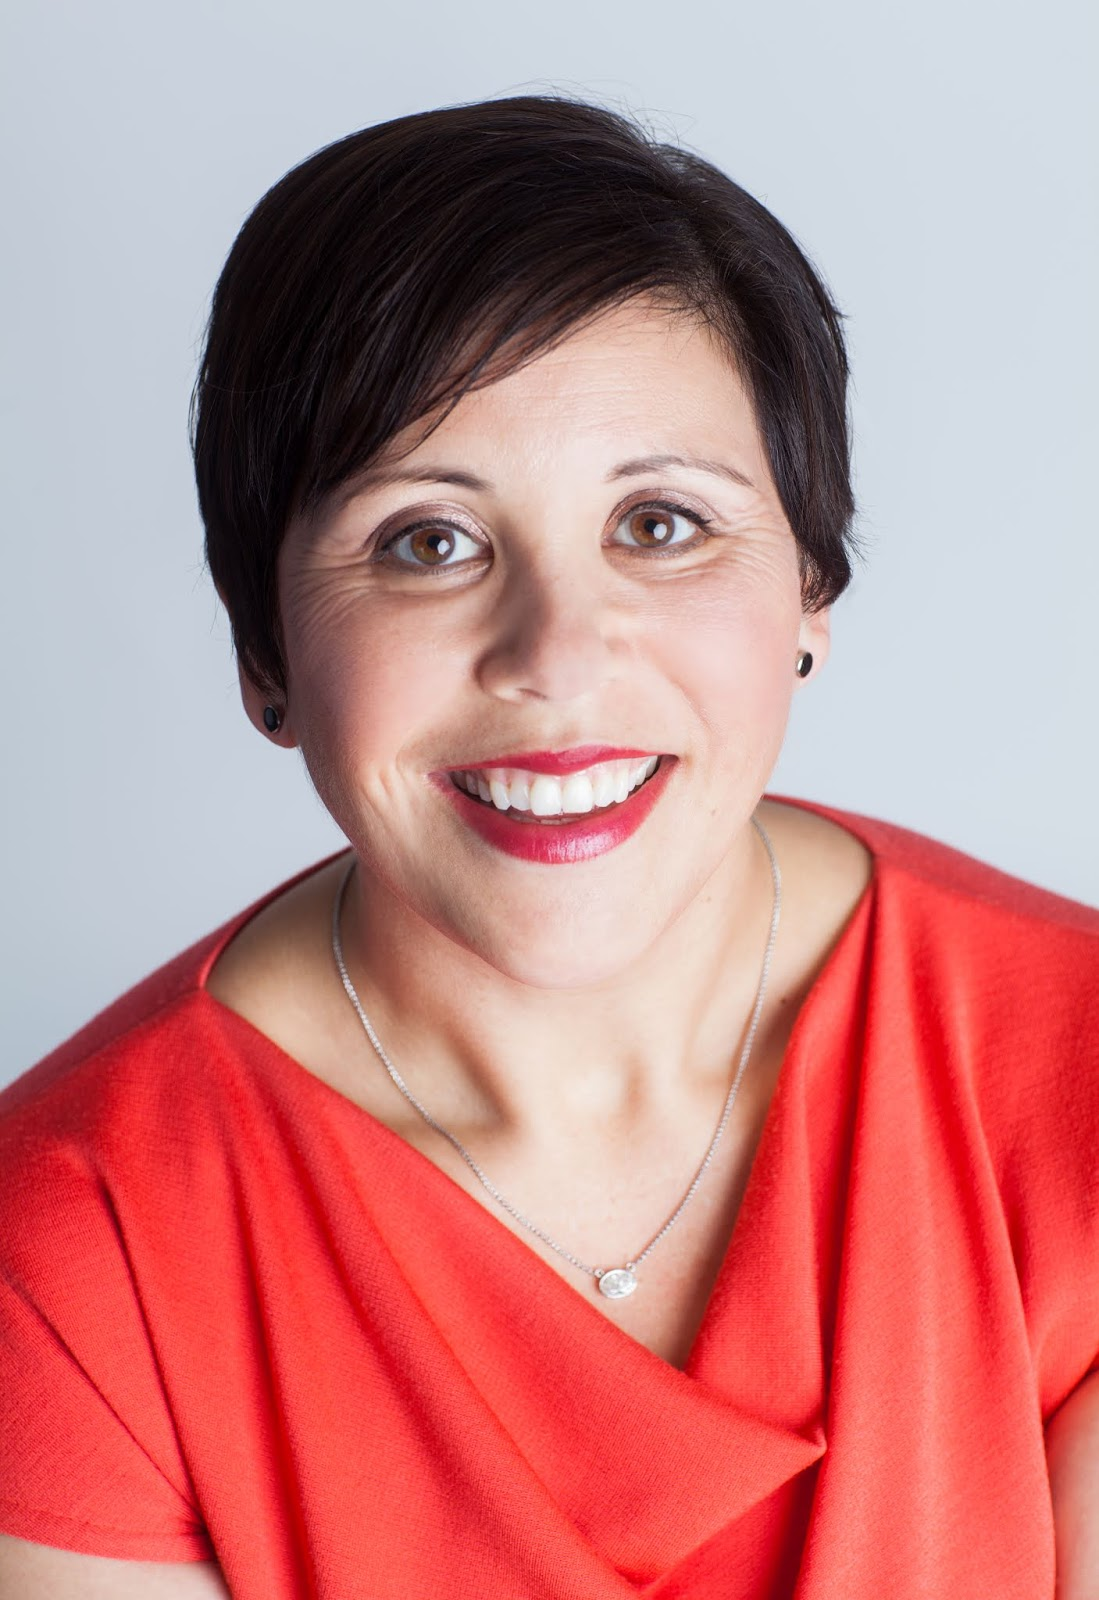 Ataxia Profile: Linda Snider